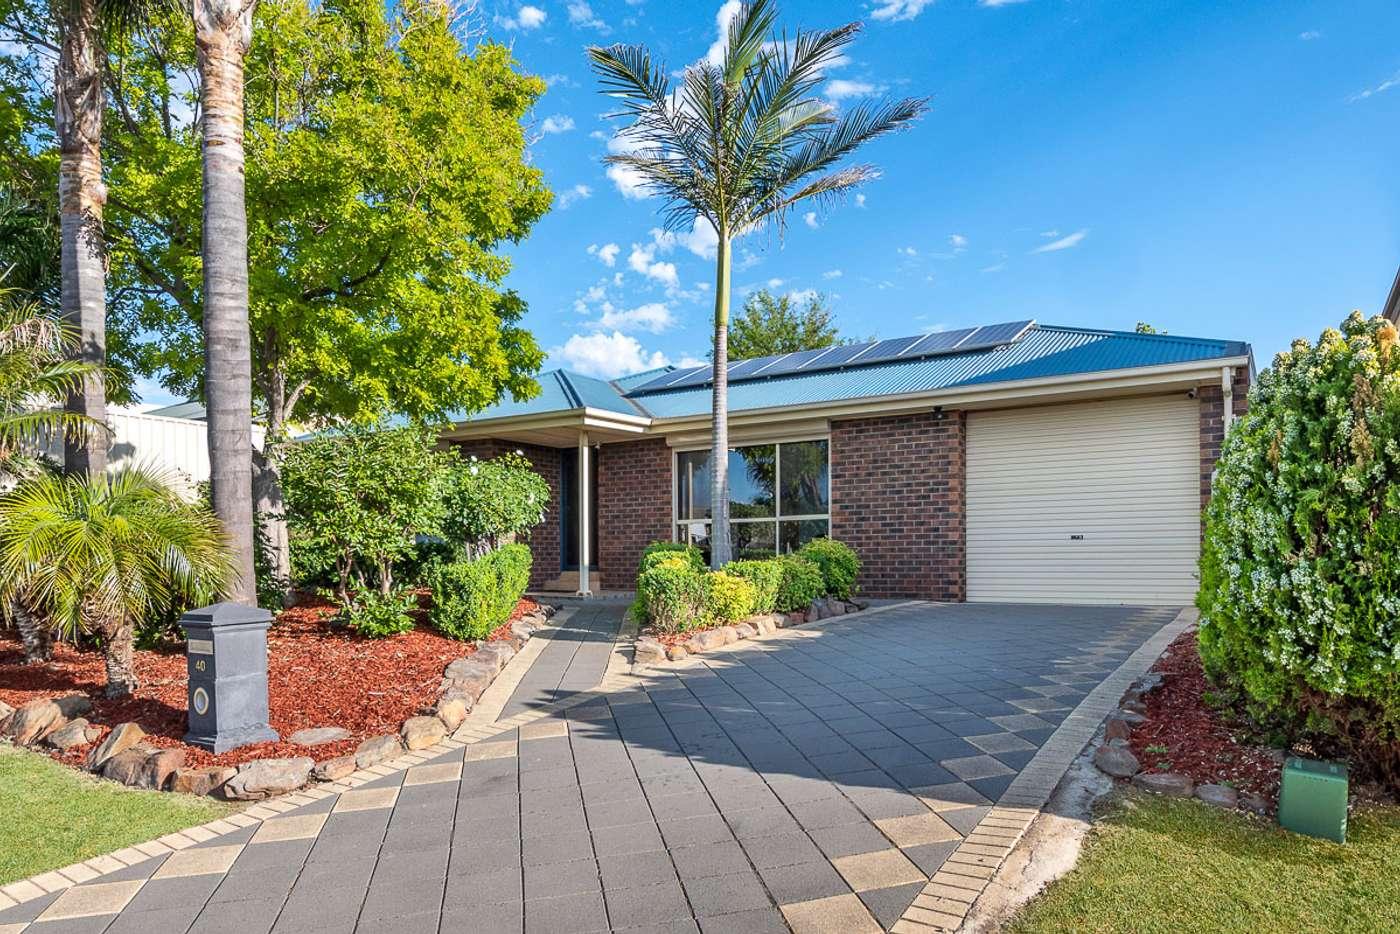 Main view of Homely house listing, 40 Davis Avenue, Christies Beach SA 5165